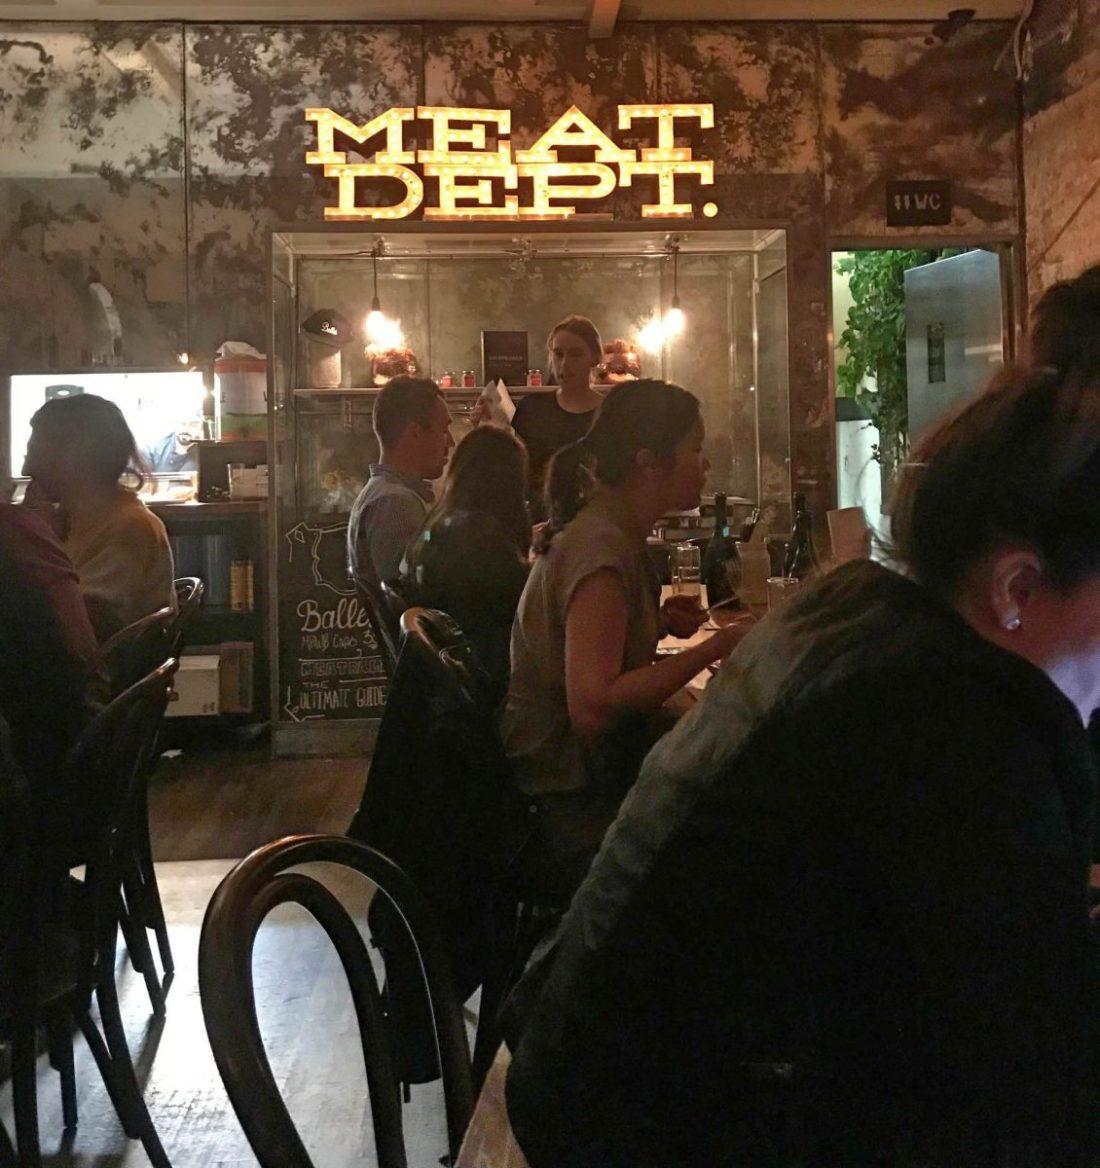 Meatballs and Wine